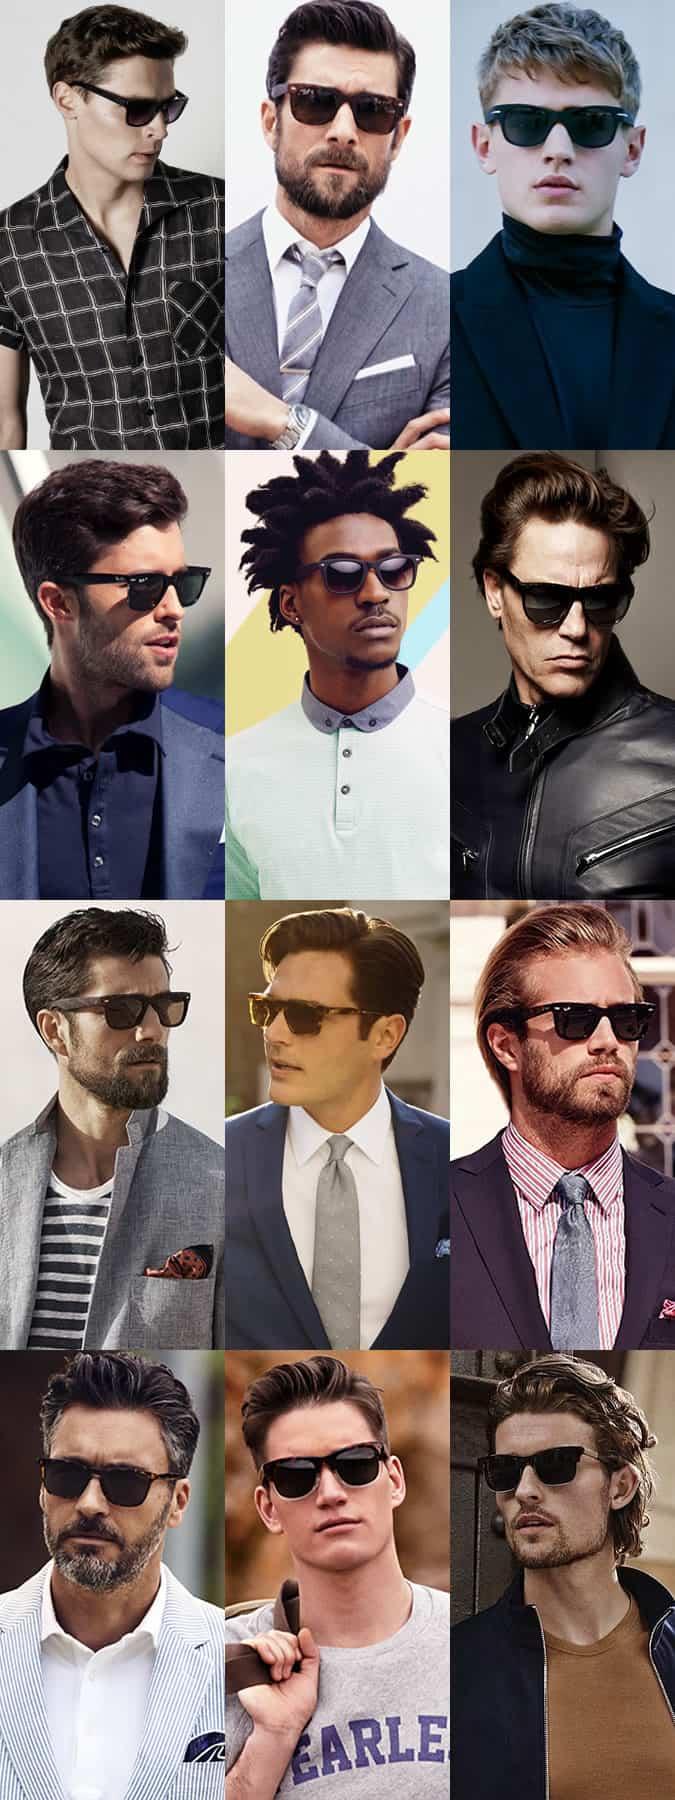 Men's Wayfarer Sunglasses Lookbook